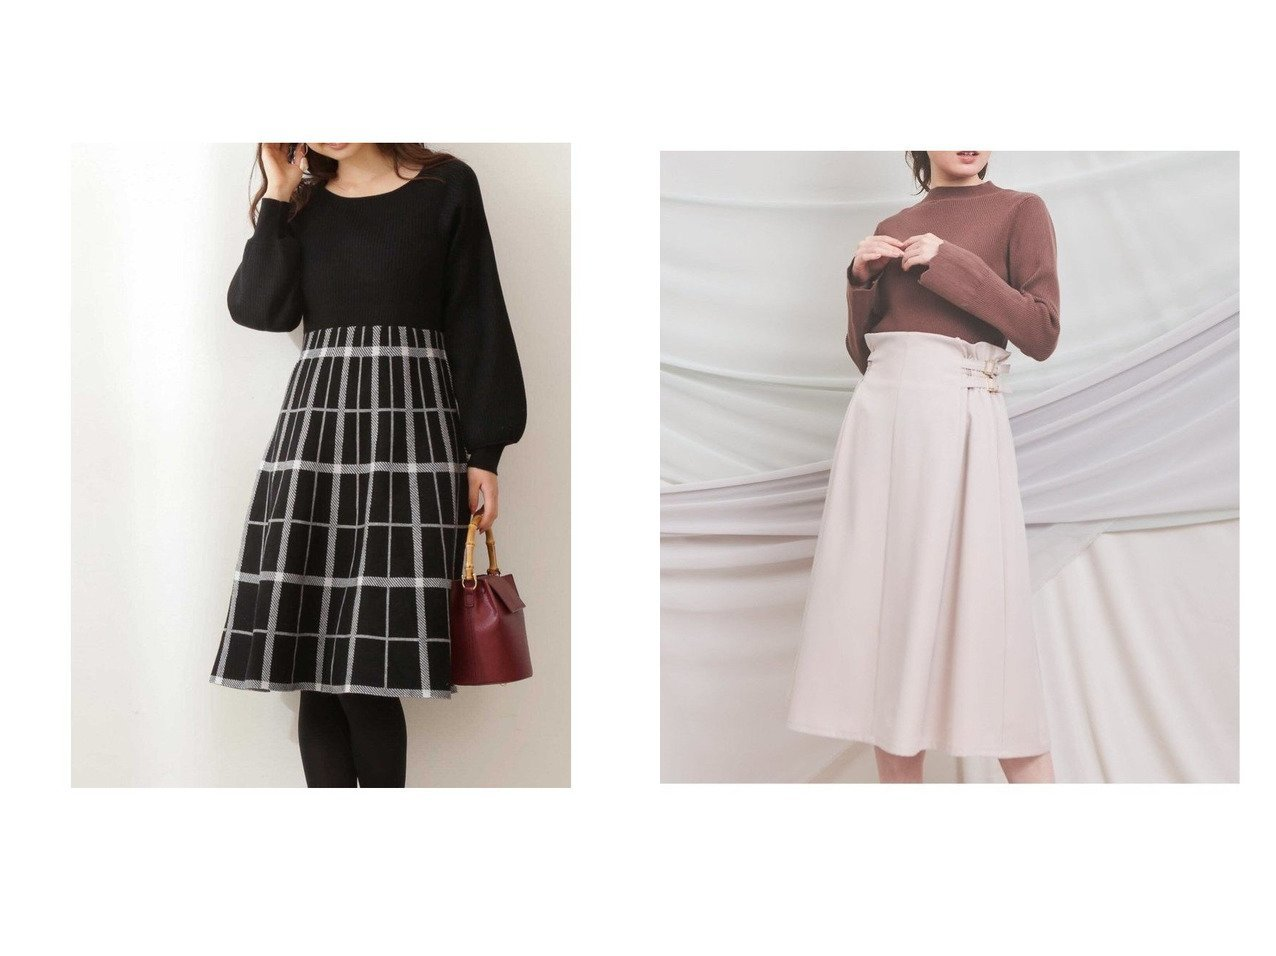 【Noela/ノエラ】のベルテッドジャンスカ&【PROPORTION BODY DRESSING/プロポーション ボディドレッシング】のチェックニットワンピース ワンピース・ドレスのおすすめ!人気、トレンド・レディースファッションの通販  おすすめで人気の流行・トレンド、ファッションの通販商品 メンズファッション・キッズファッション・インテリア・家具・レディースファッション・服の通販 founy(ファニー) https://founy.com/ ファッション Fashion レディースファッション WOMEN ワンピース Dress ニットワンピース Knit Dresses タイツ チェック デコルテ ドッキング フィット フレア リブニット ロング 冬 Winter ハイネック |ID:crp329100000010190